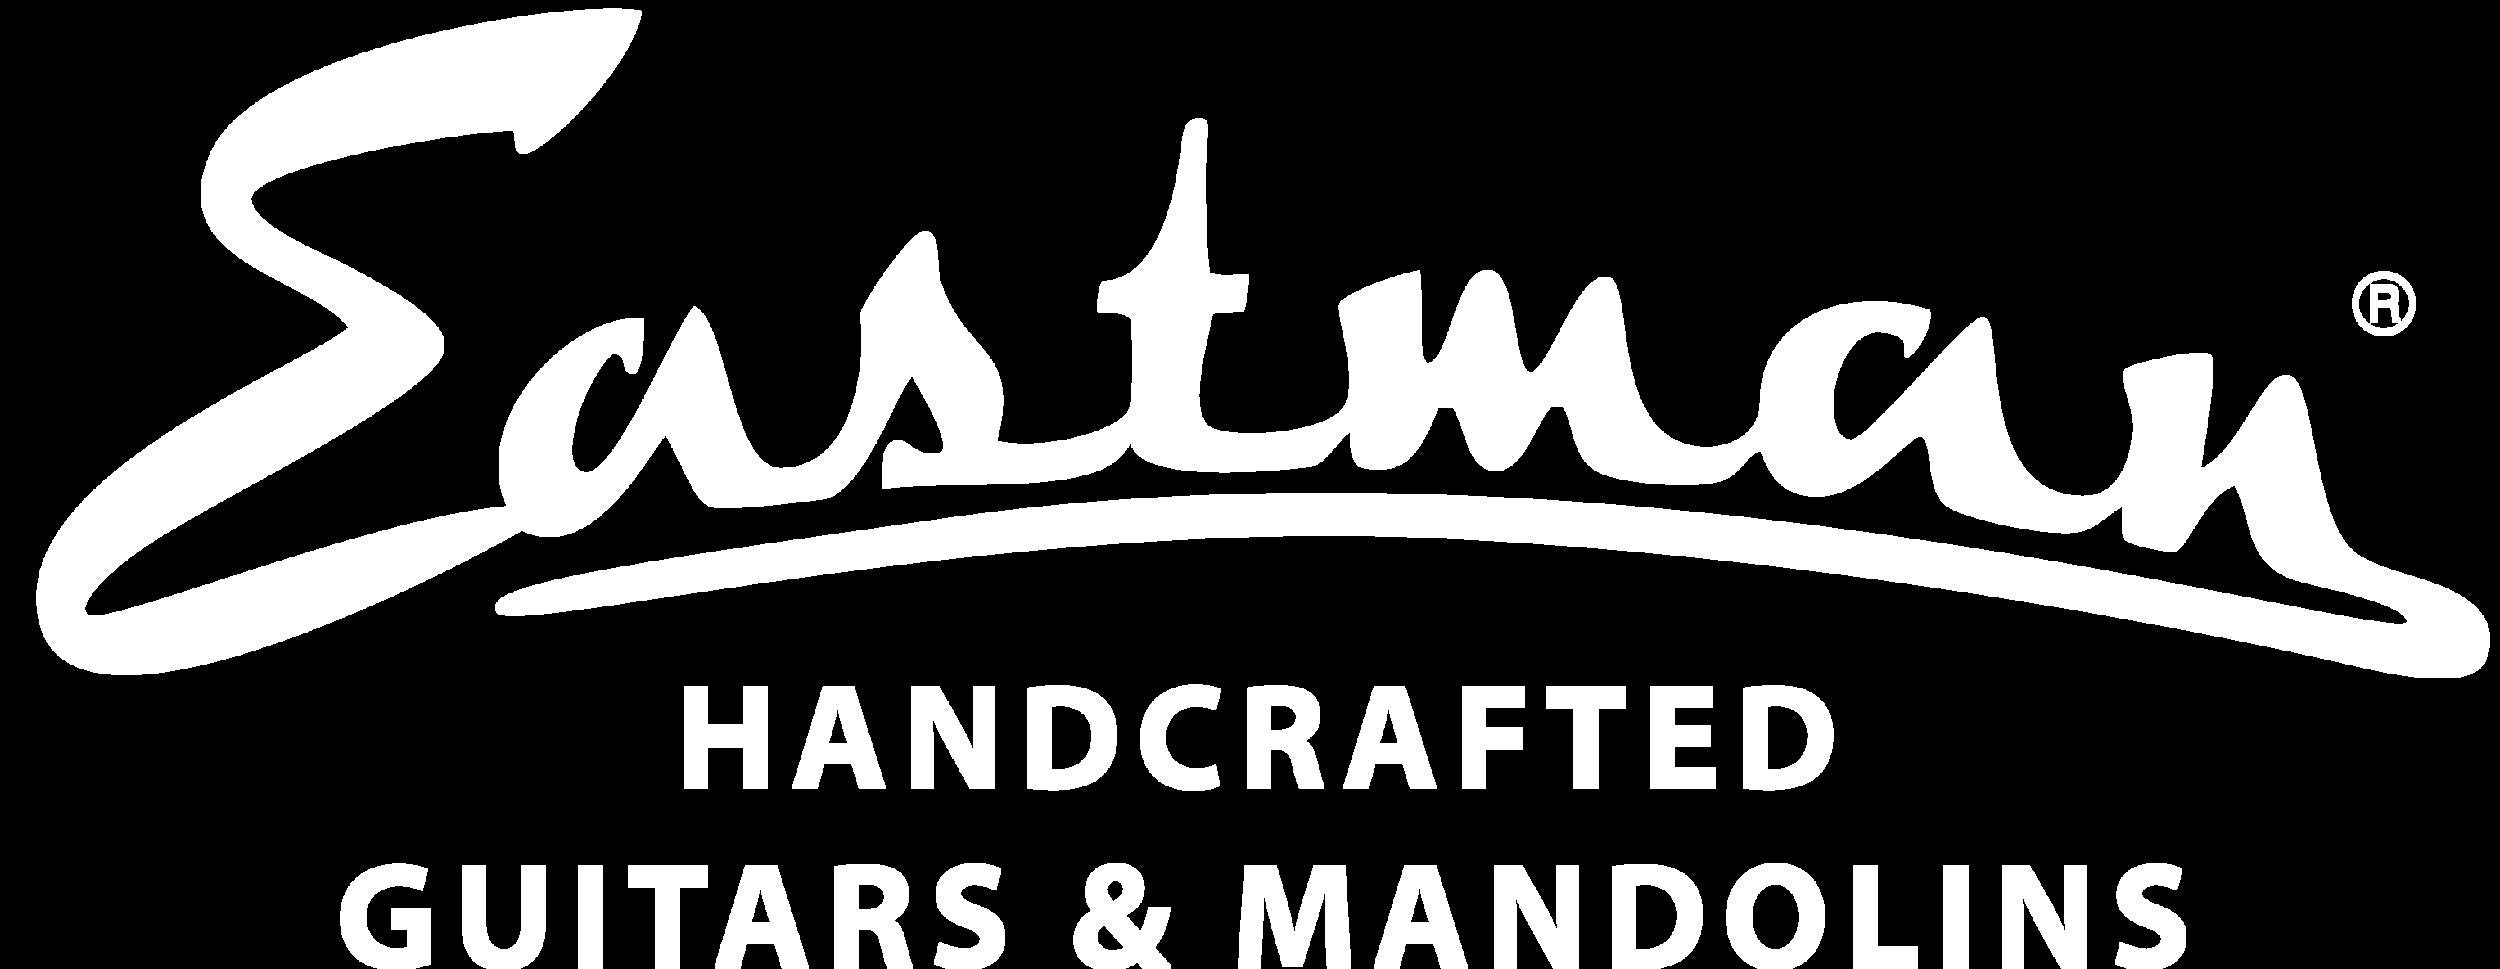 Eastman_Guitars_logo-White.png